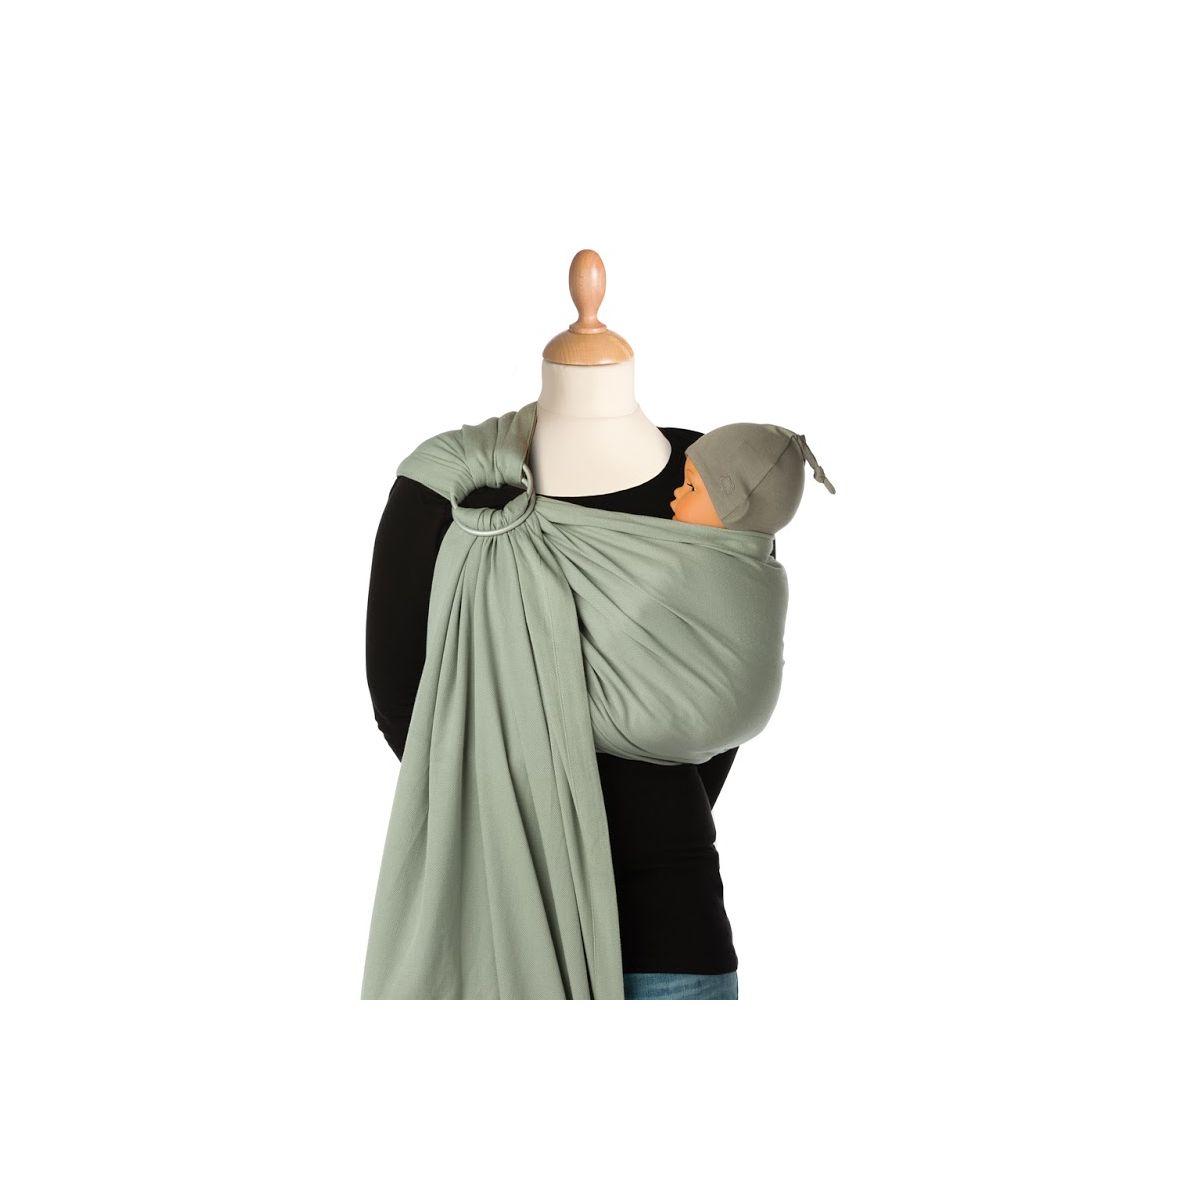 echarpe porte b b bb sling padded 990 grey violet sebio. Black Bedroom Furniture Sets. Home Design Ideas